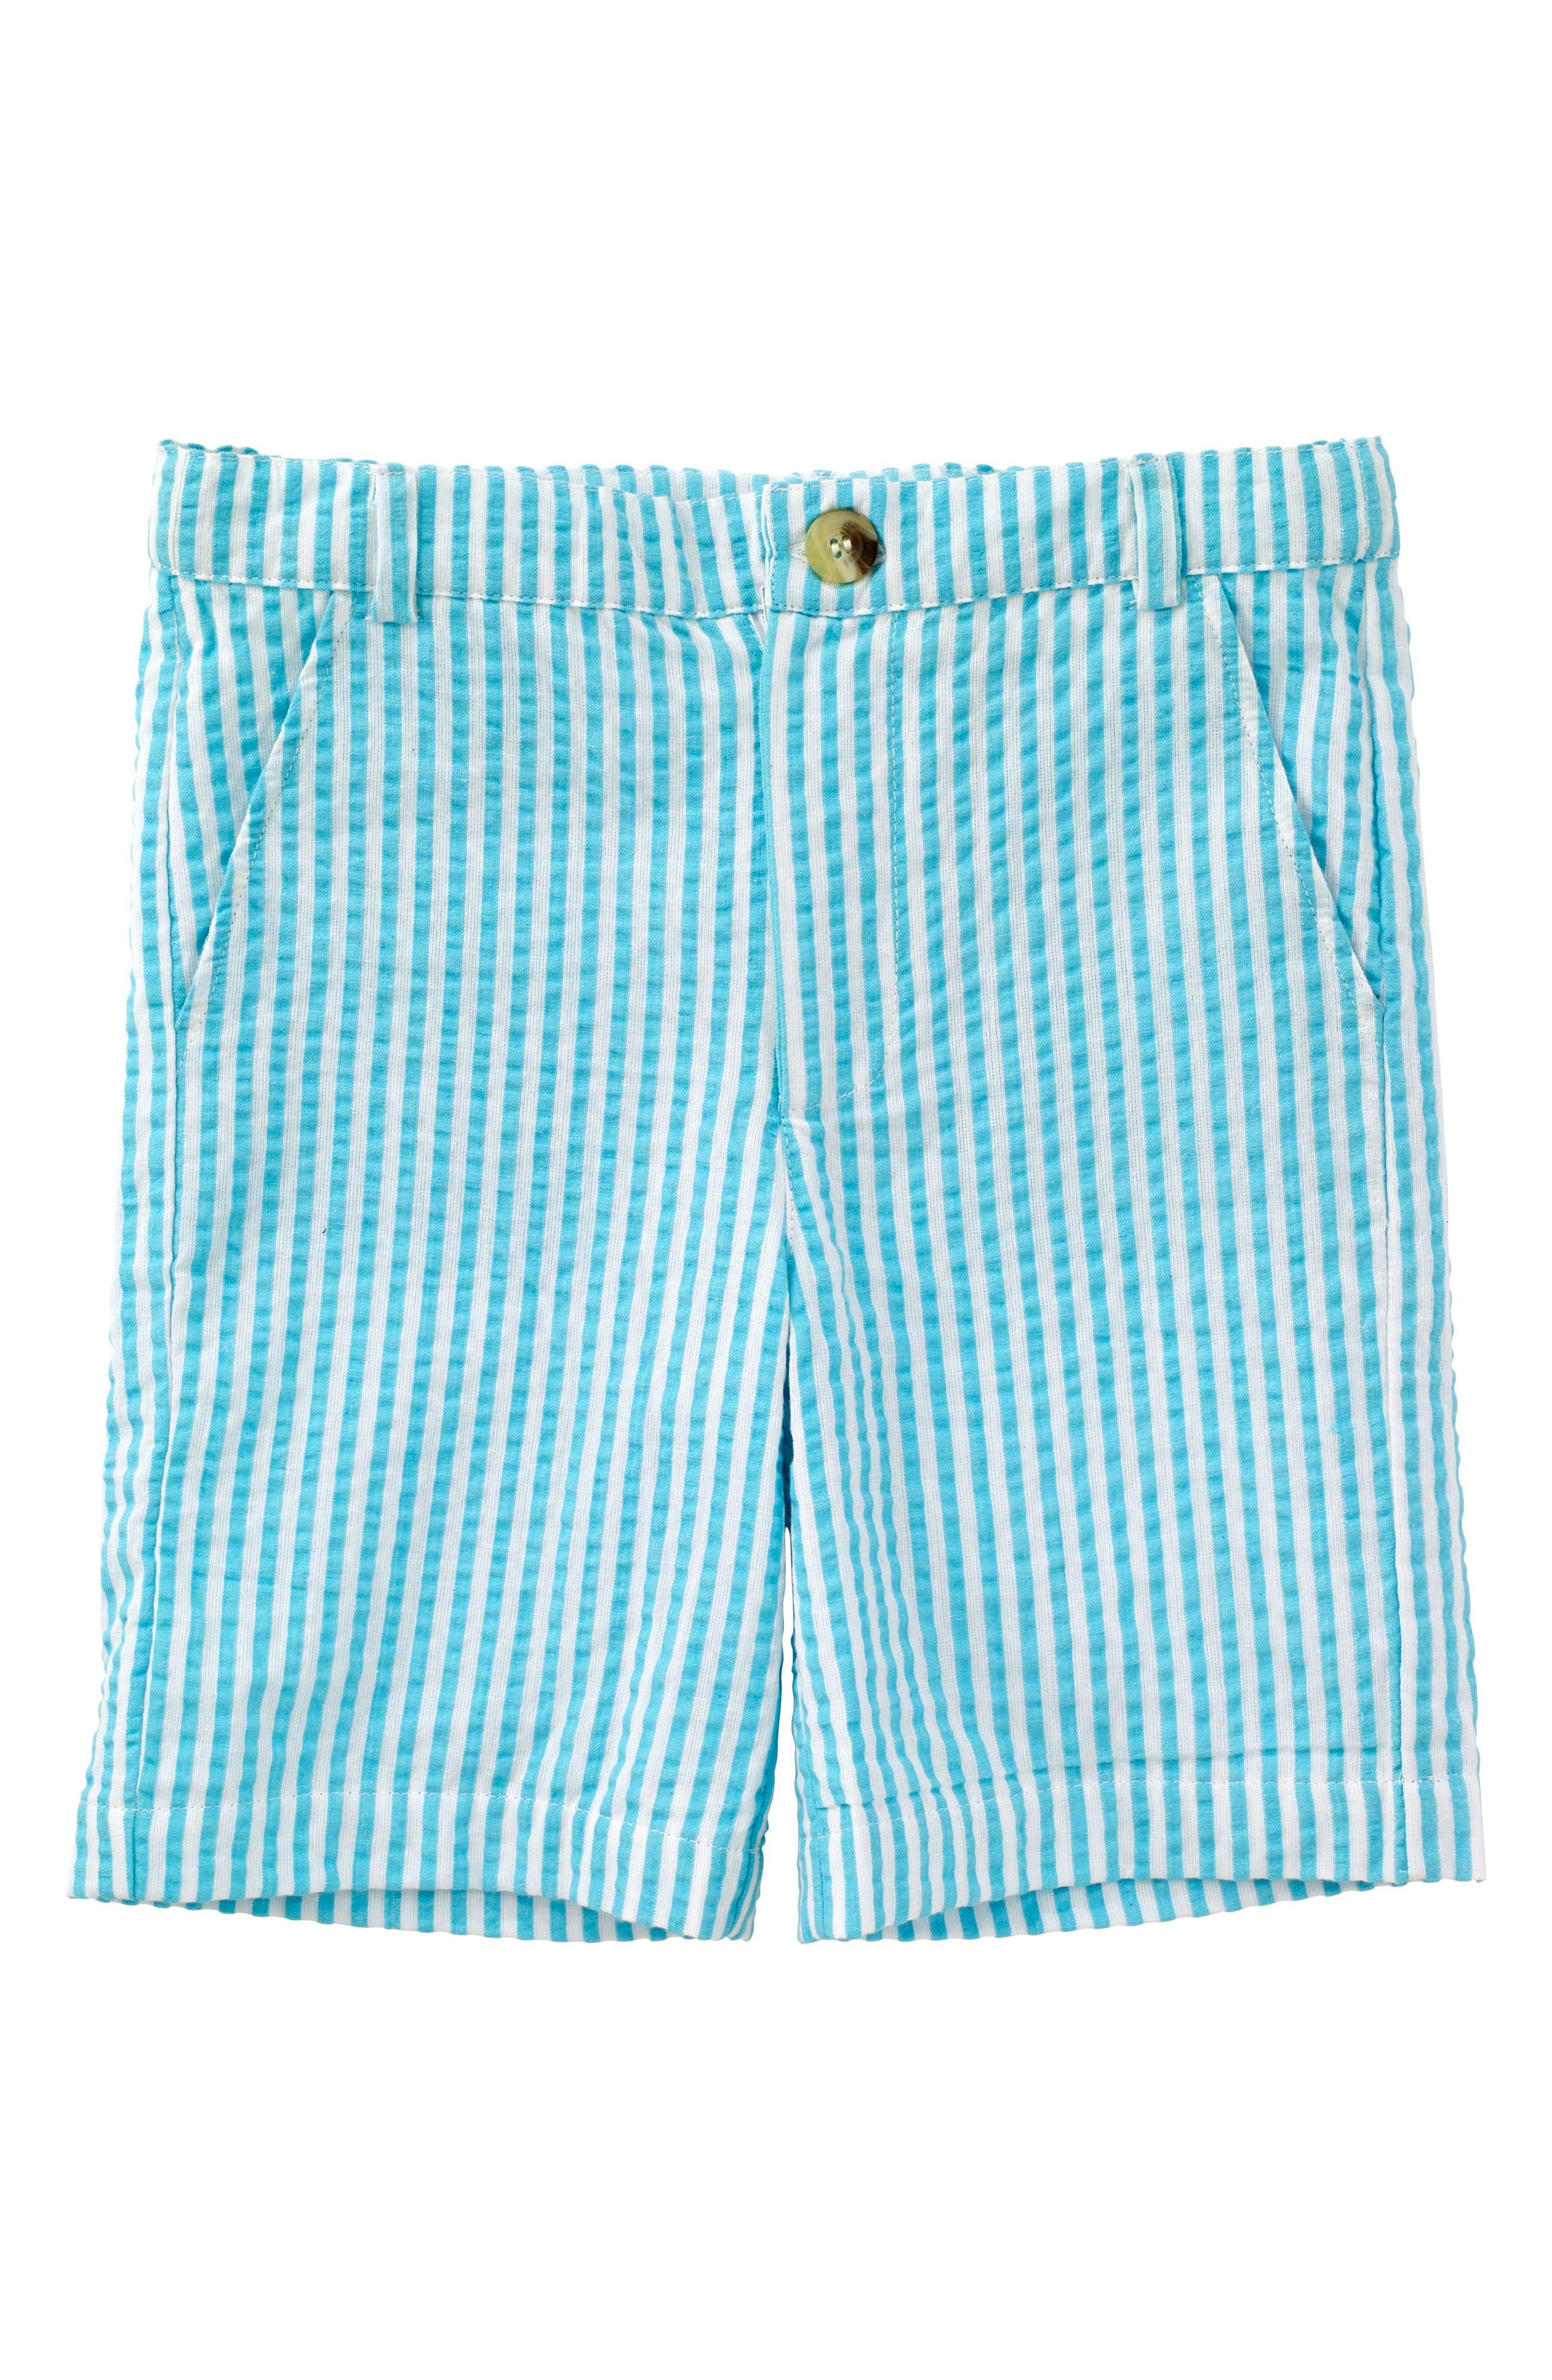 Masalababy Crosby Stripe Shorts,                             Main thumbnail 1, color,                             Turquoise